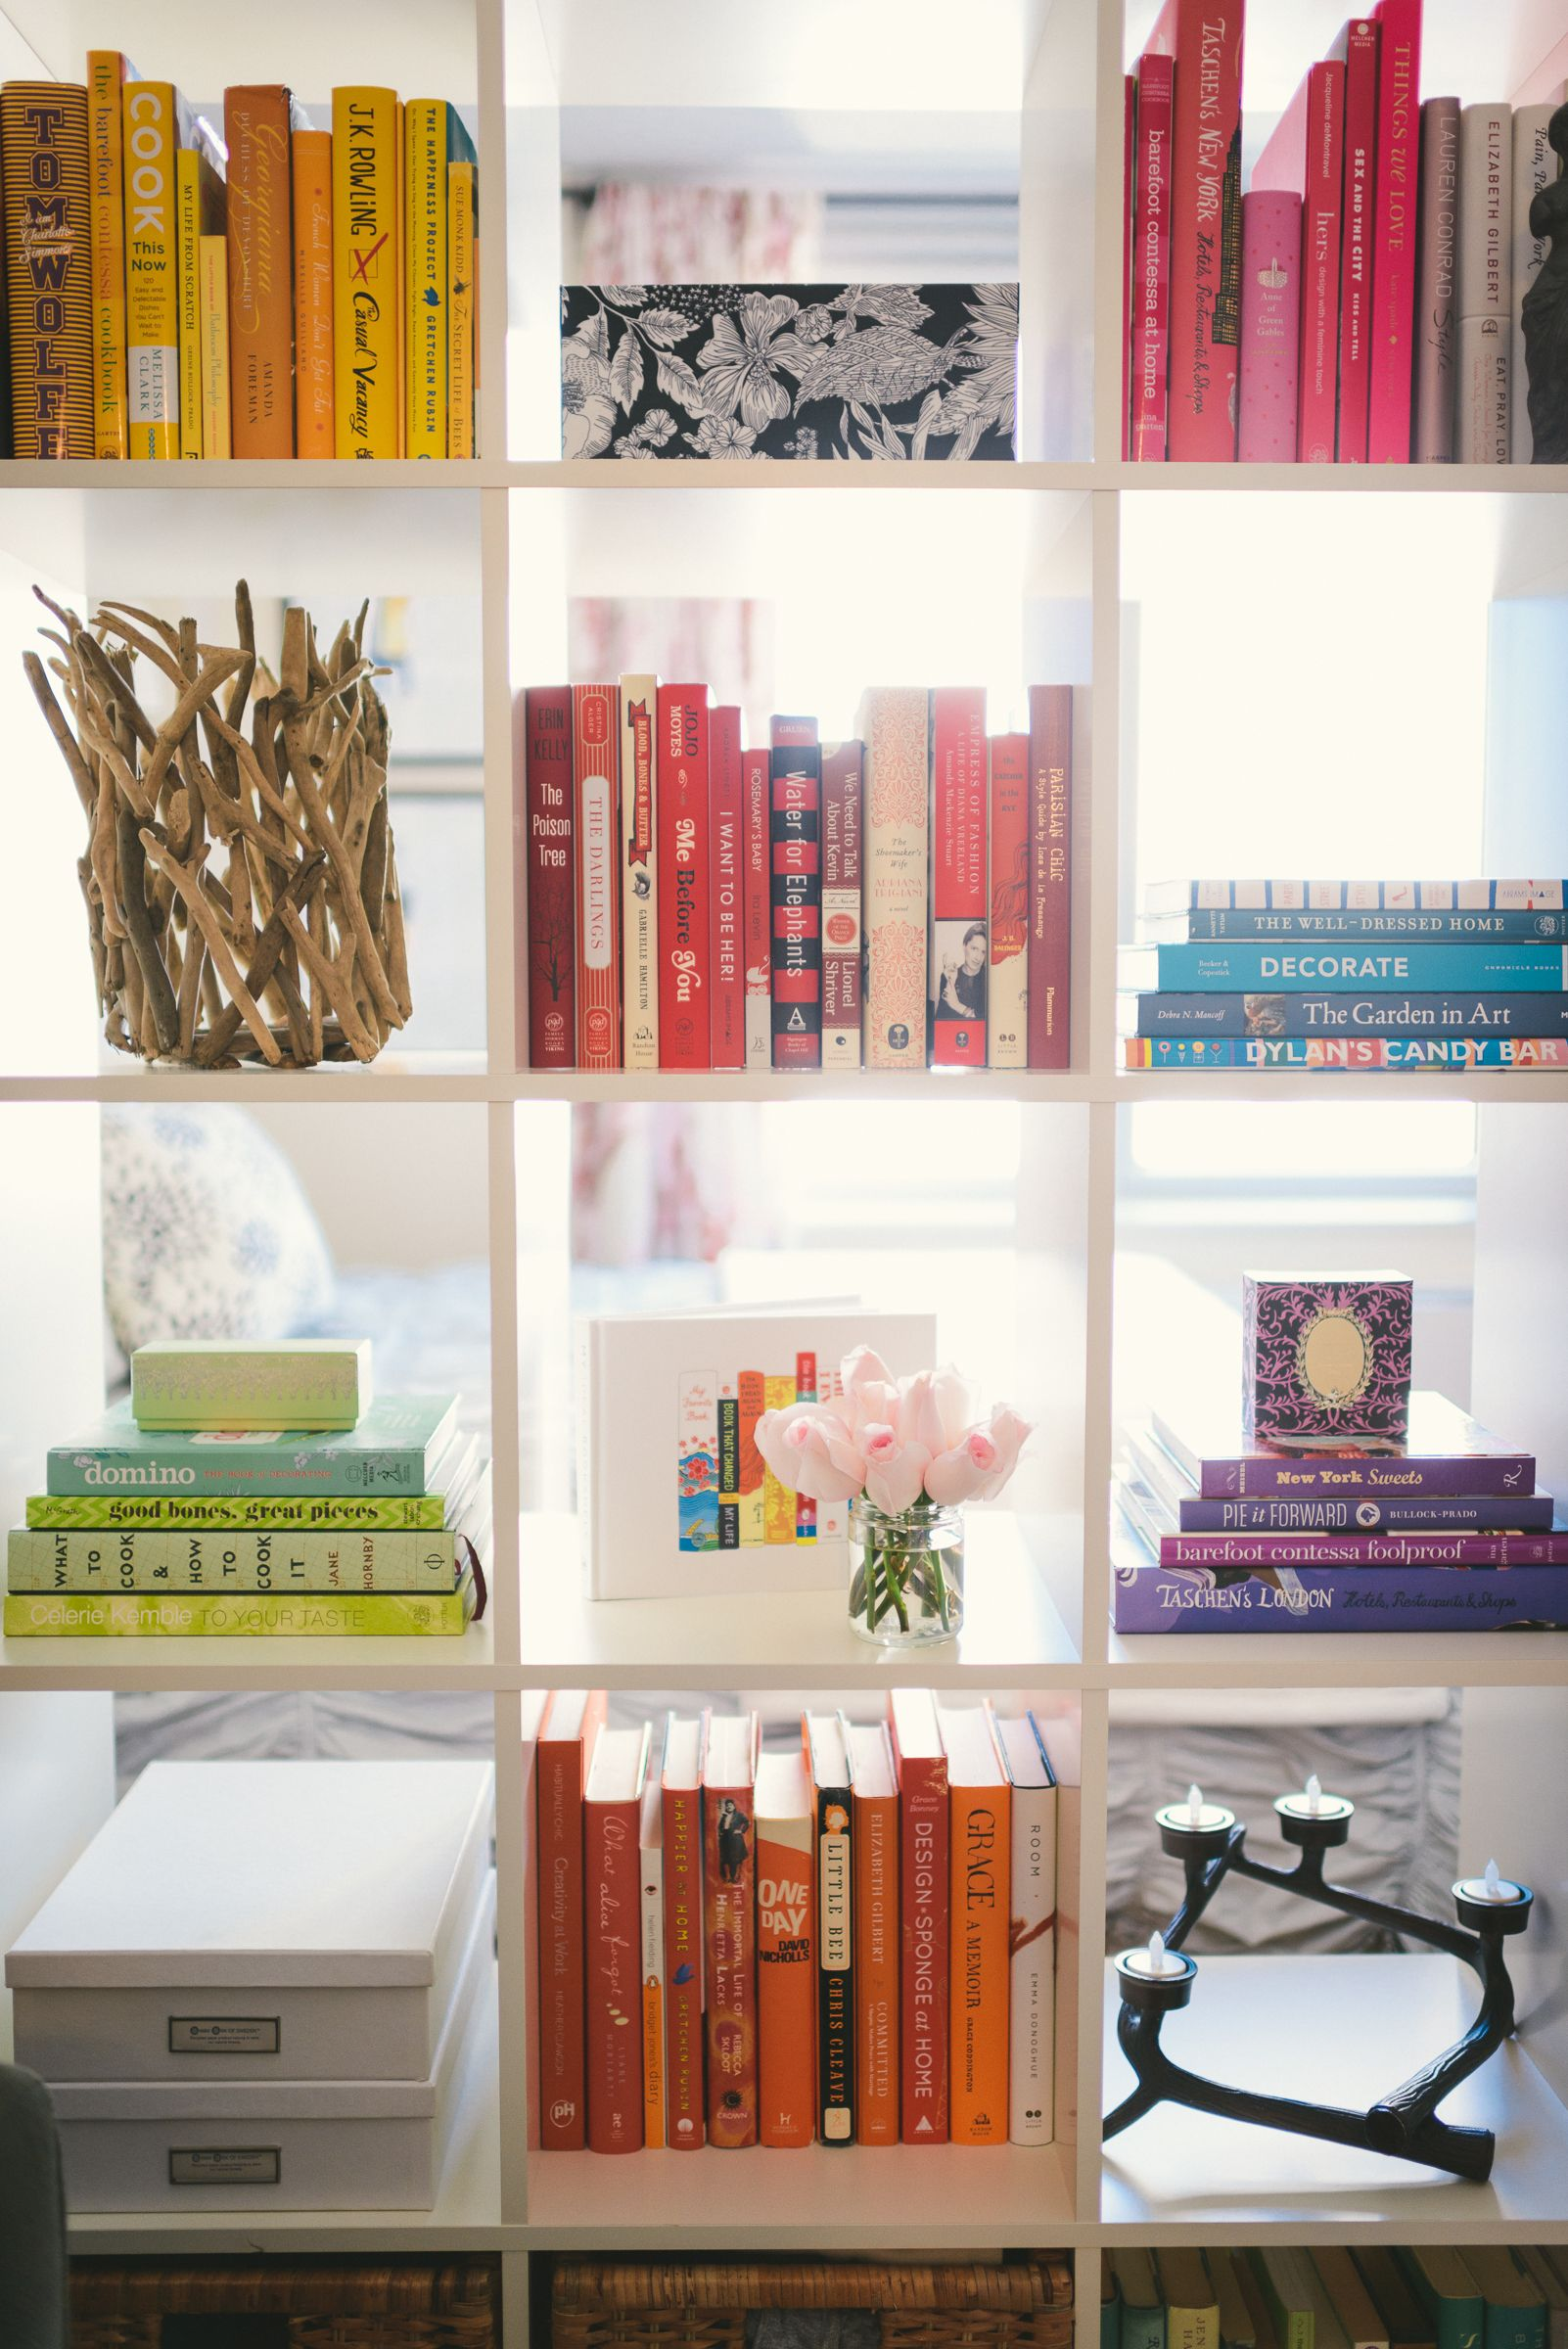 Co colour coordinated bookshelf - Fast Tip Color Code Your Bookshelf